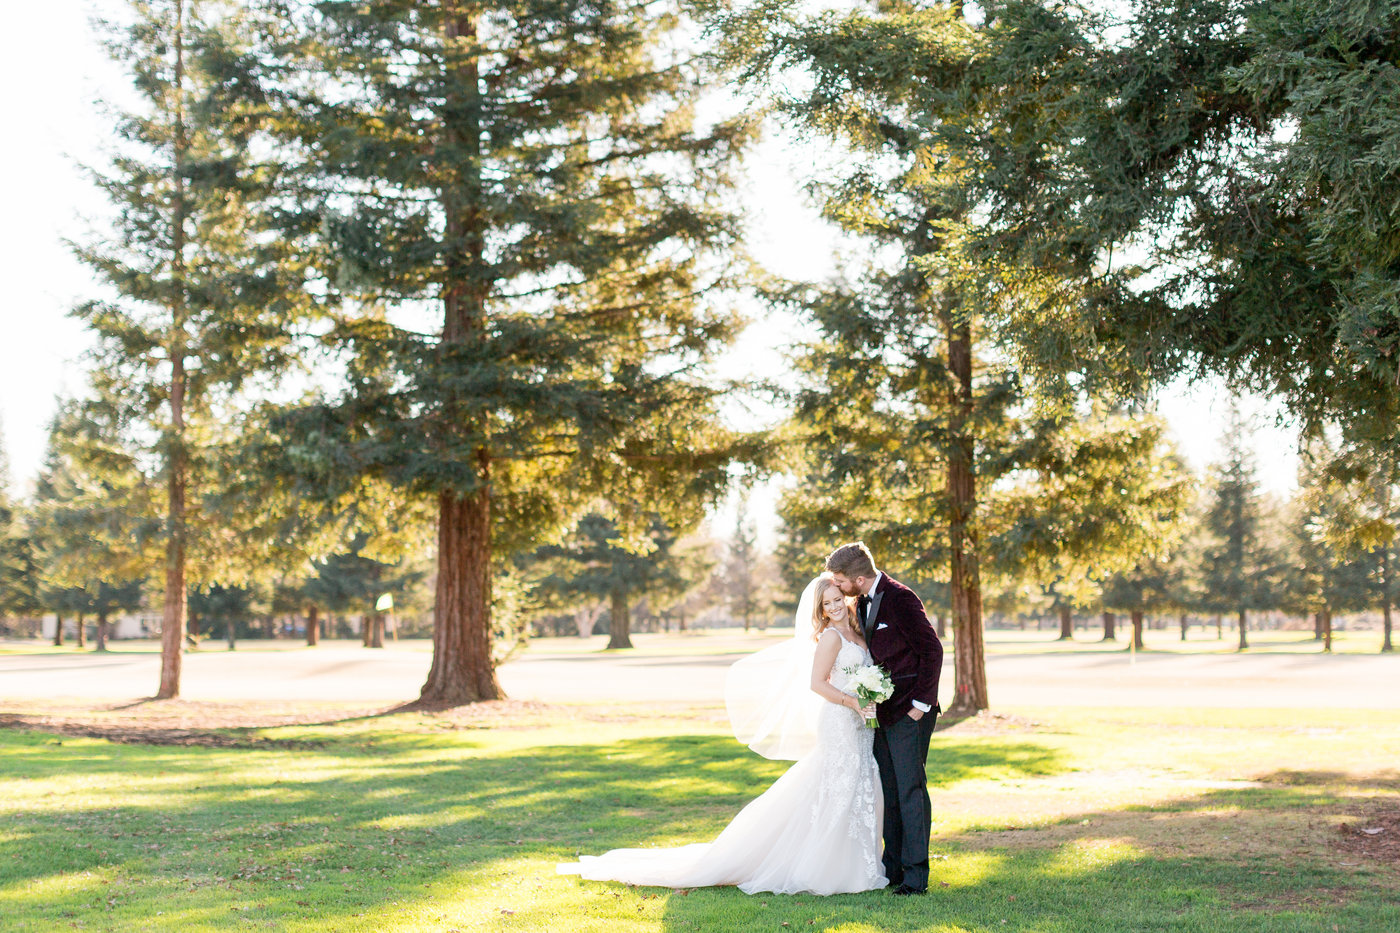 Butte-creek-country-club-sunset-wedding-photosjpg